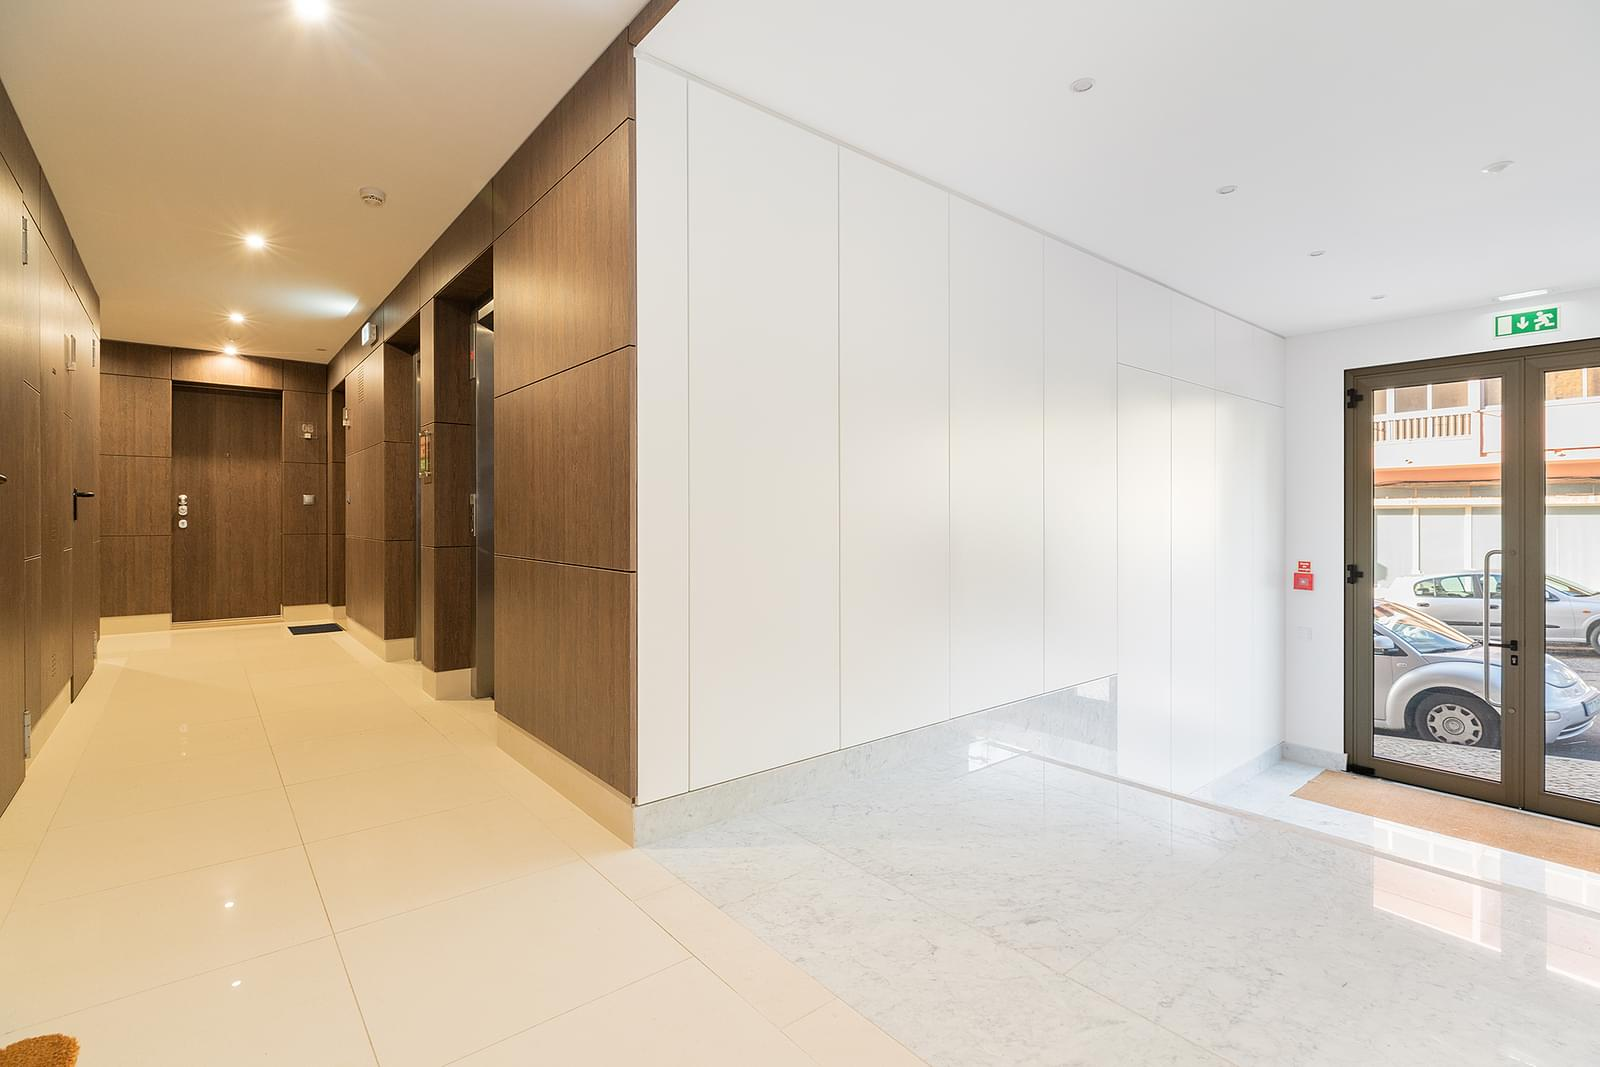 pf18846-apartamento-t2-lisboa-a126303e-10ad-41c3-958b-57247fb480ad